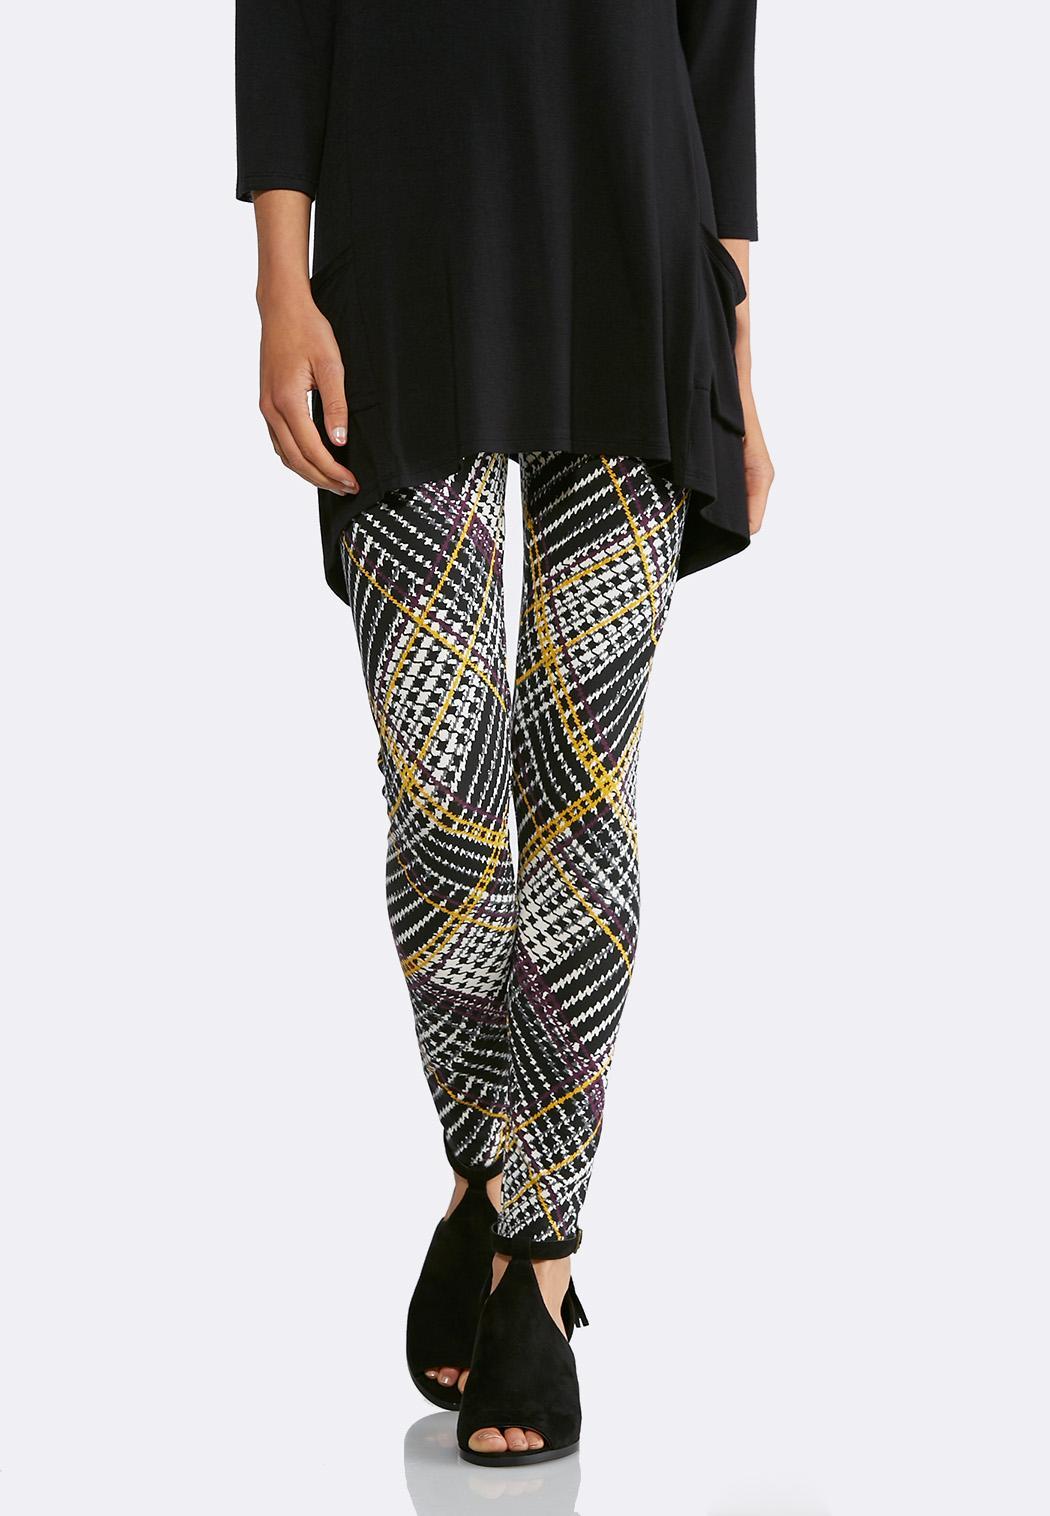 Plus Size Patterned Leggings Cool Design Ideas